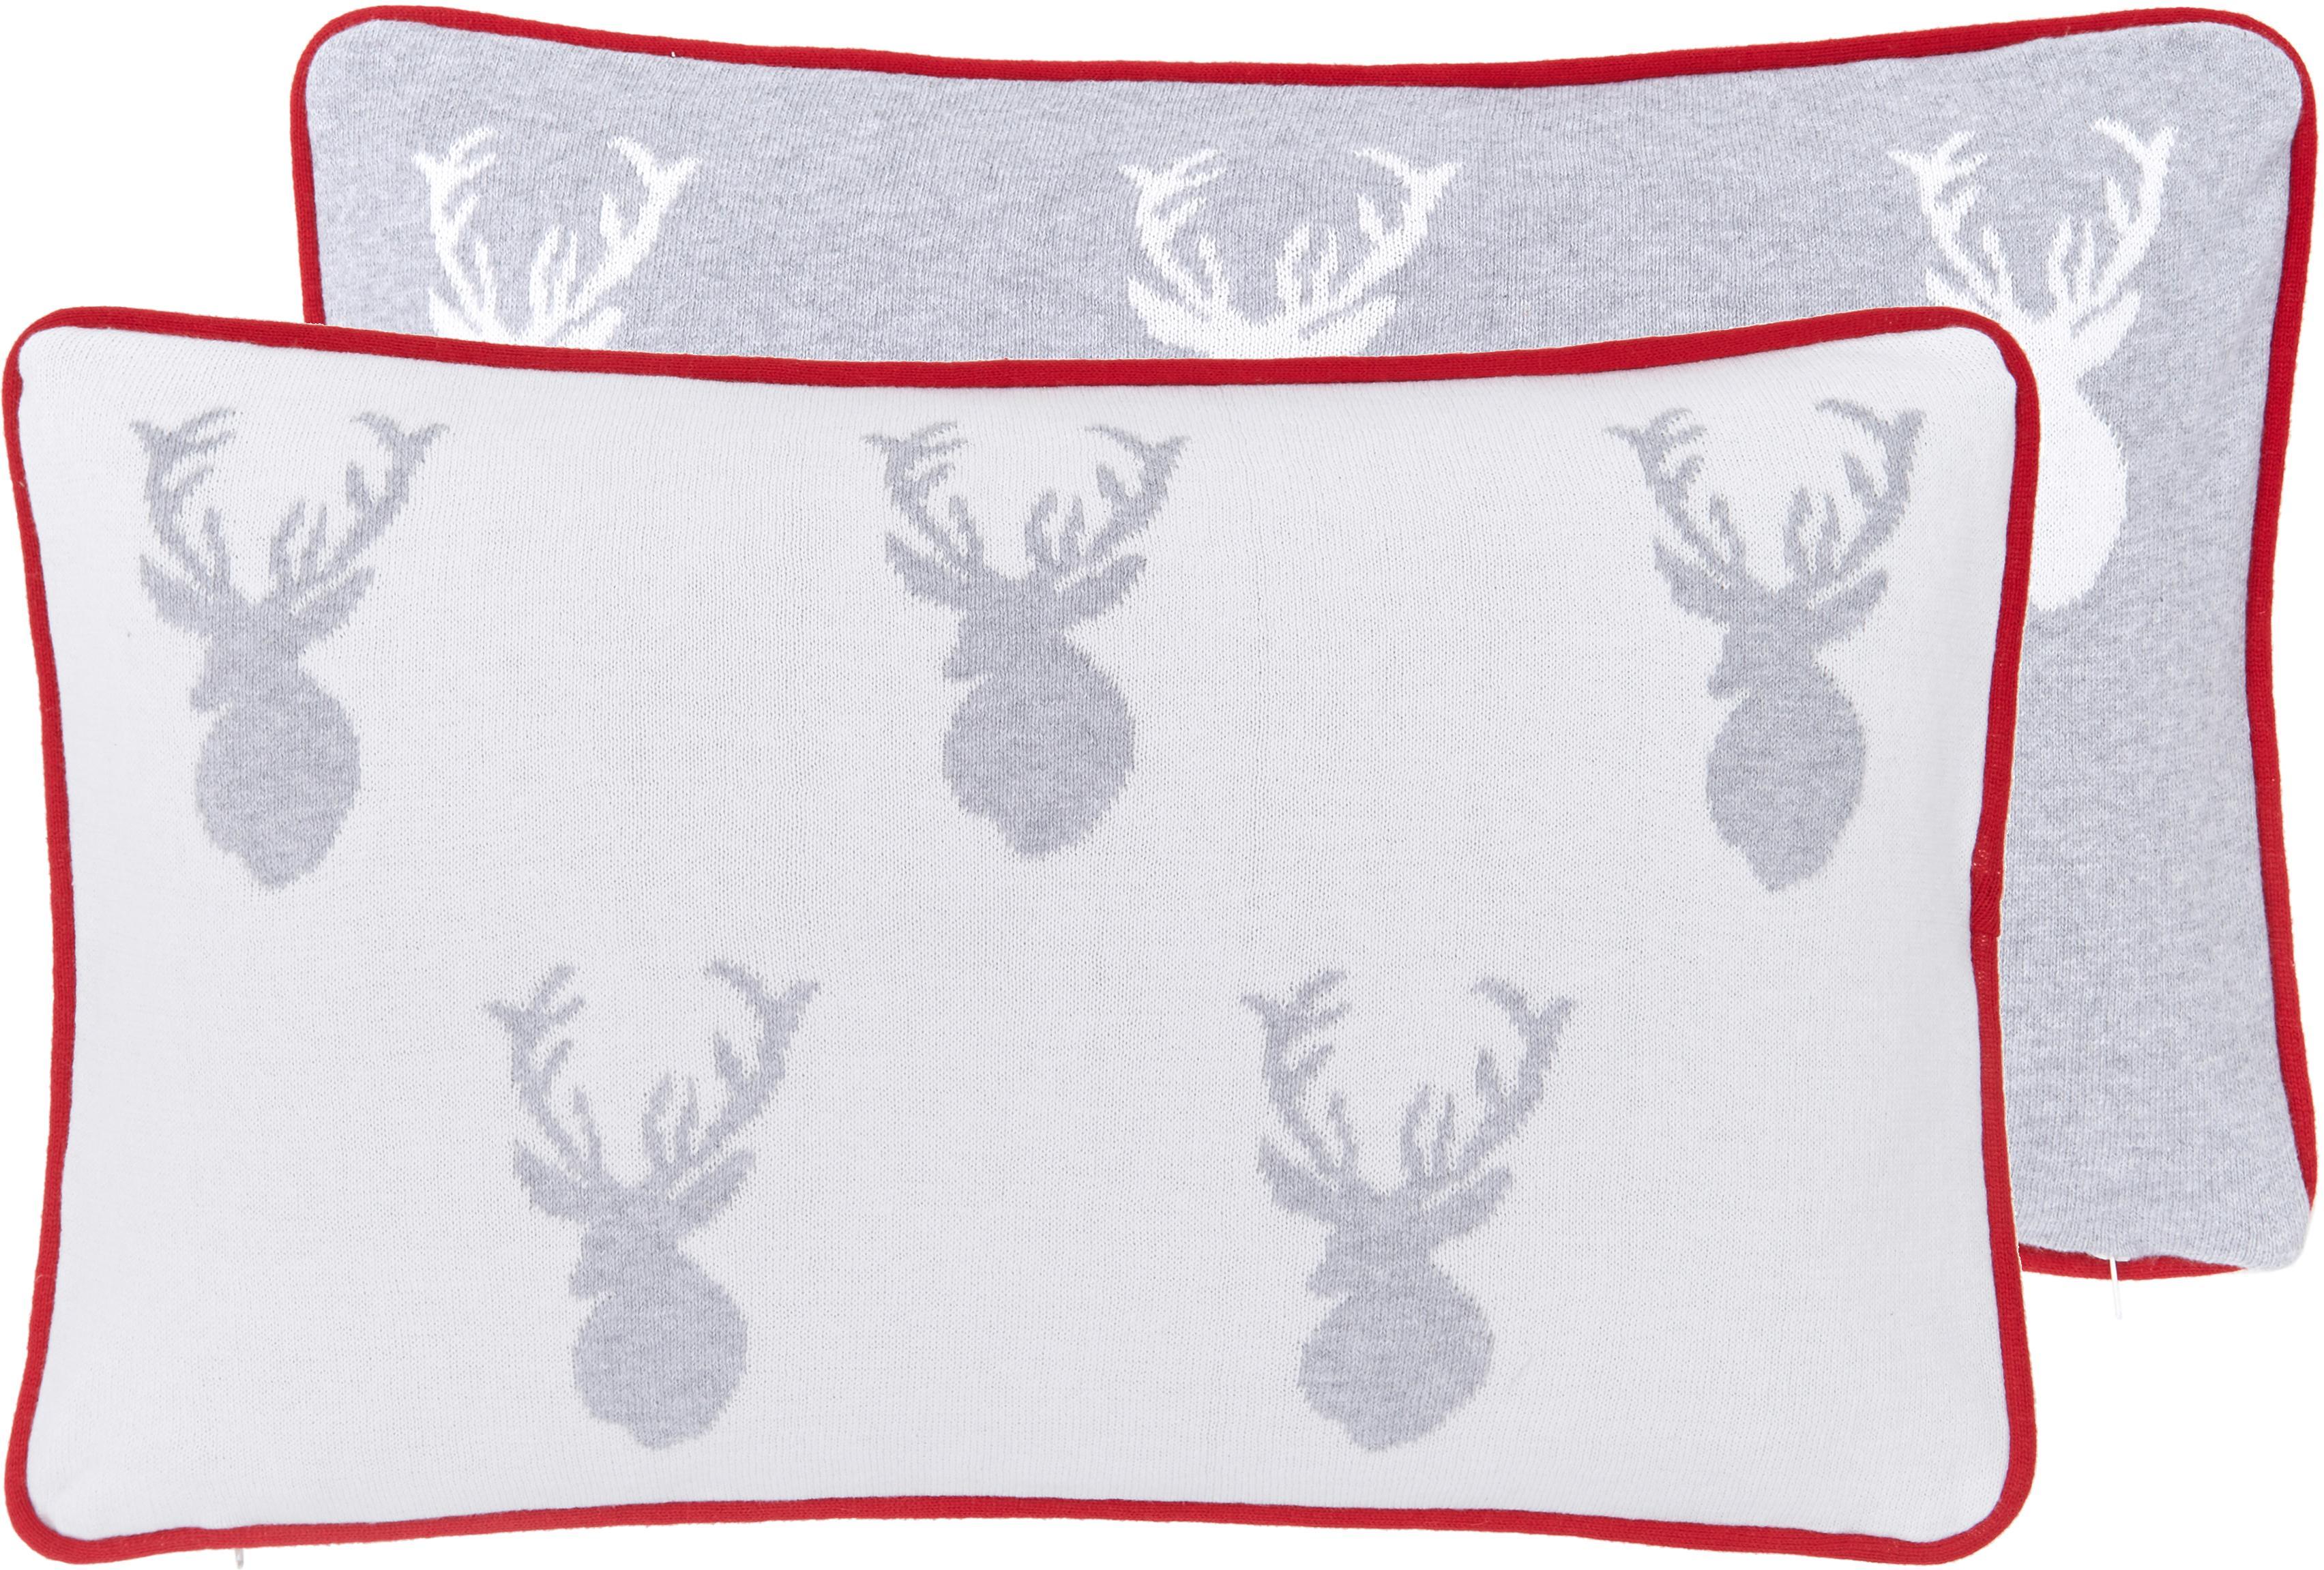 Funda de cojín de punto Forest, caras distintas, 100%algodón, Blanco crema, rojo, An 30 x L 50 cm